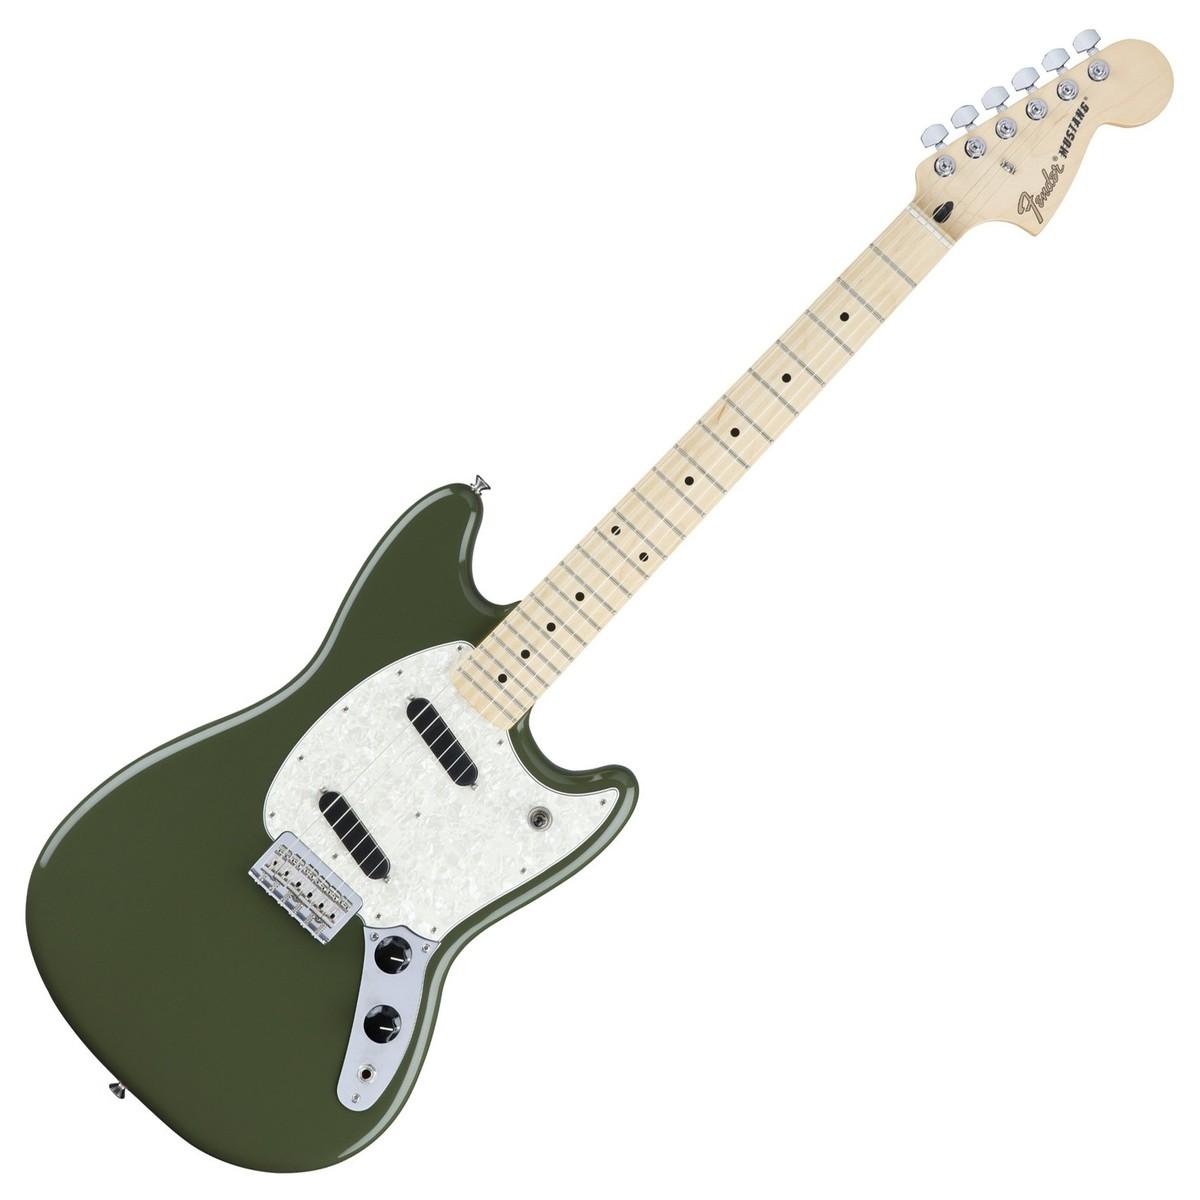 Fender Mustang Olive Green